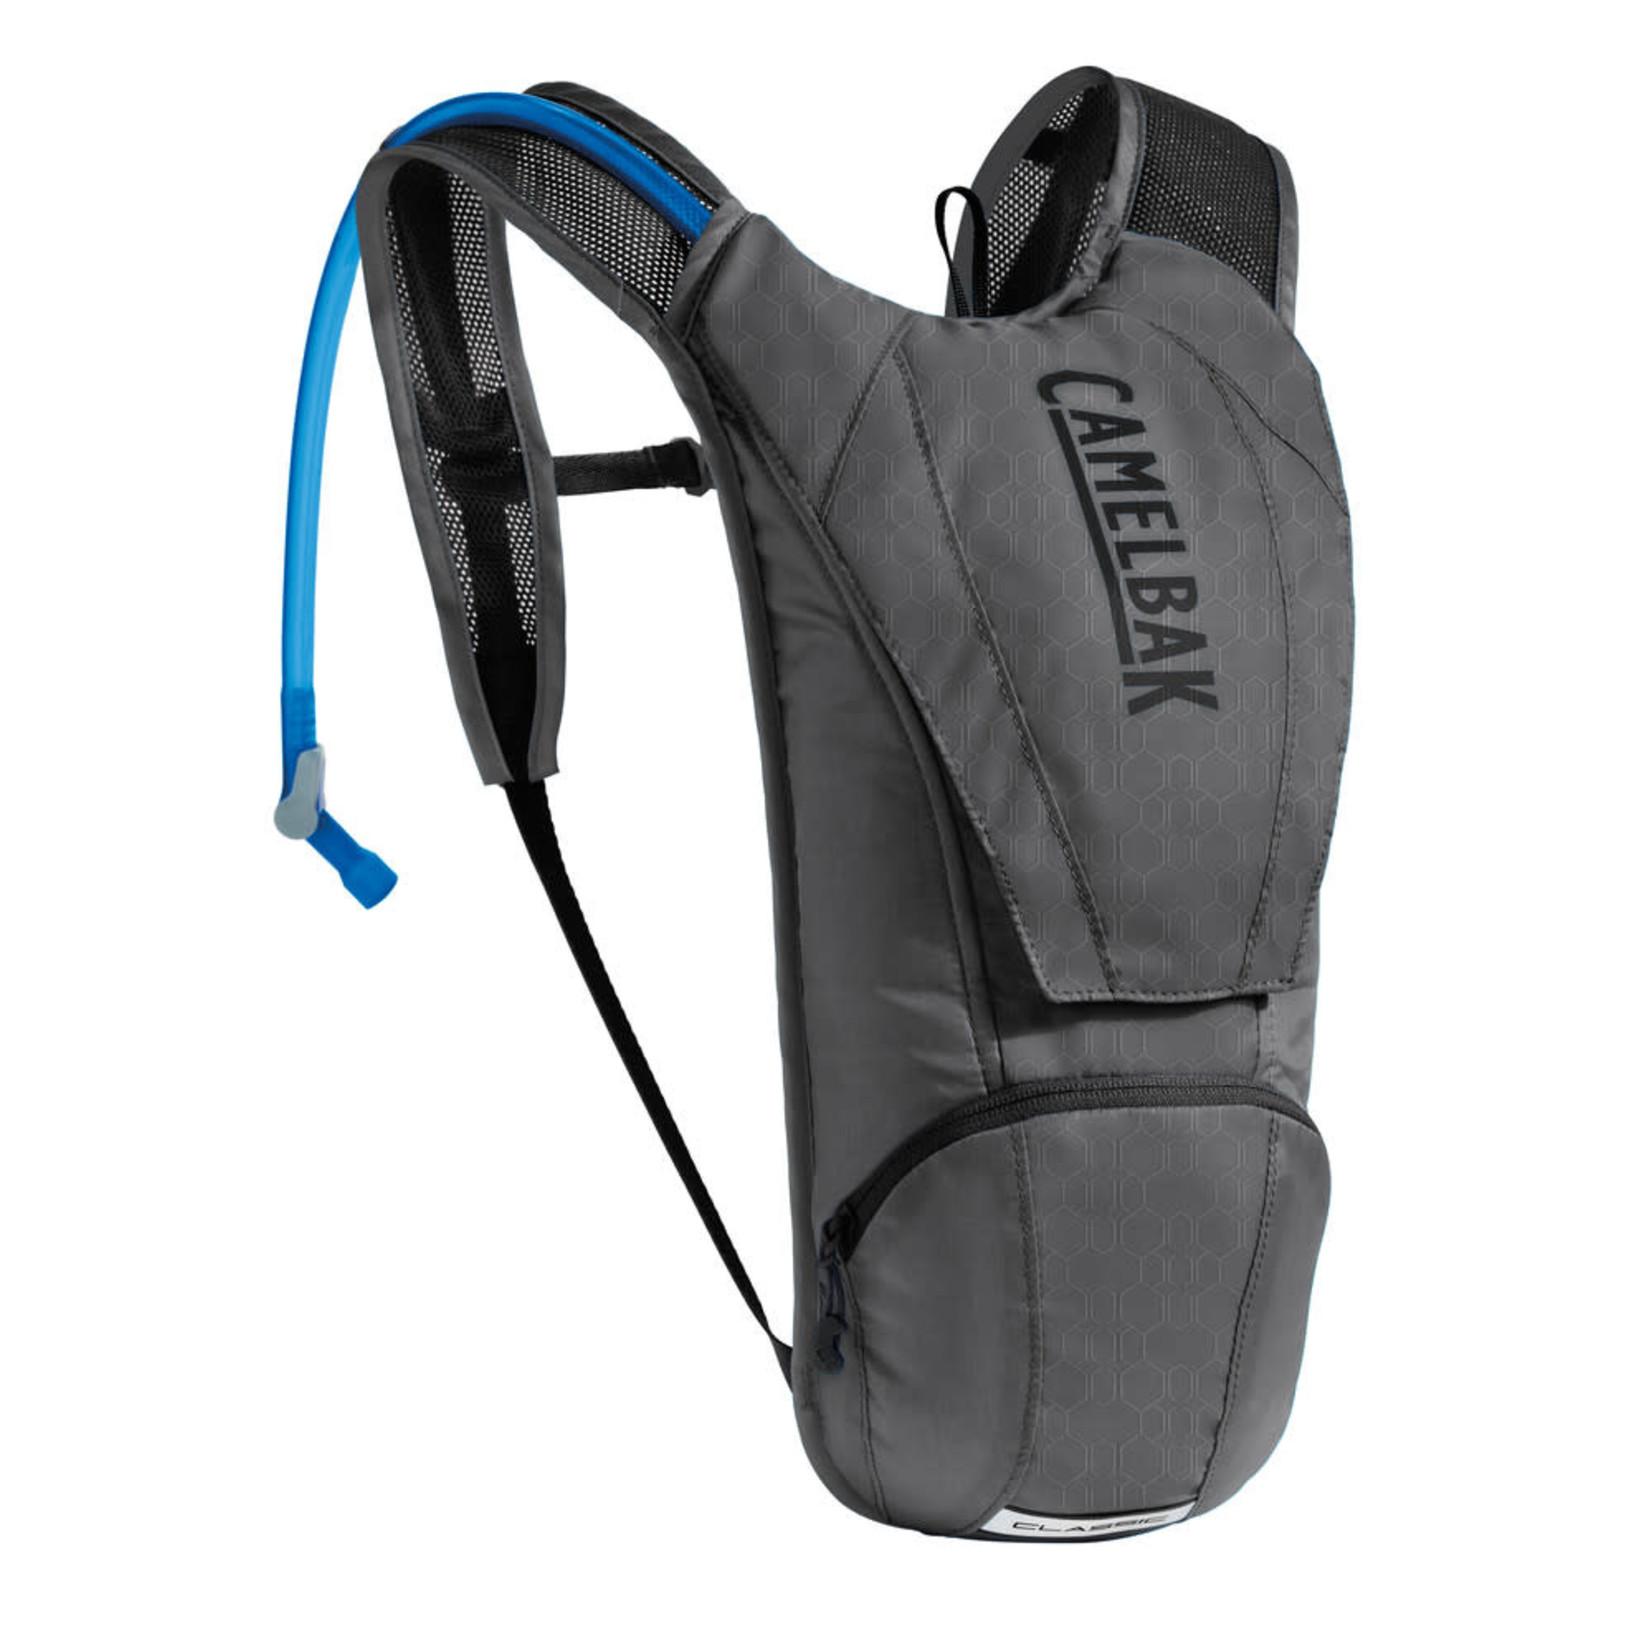 Camelbak Camelbak Classic 2.5L Hydration Pack